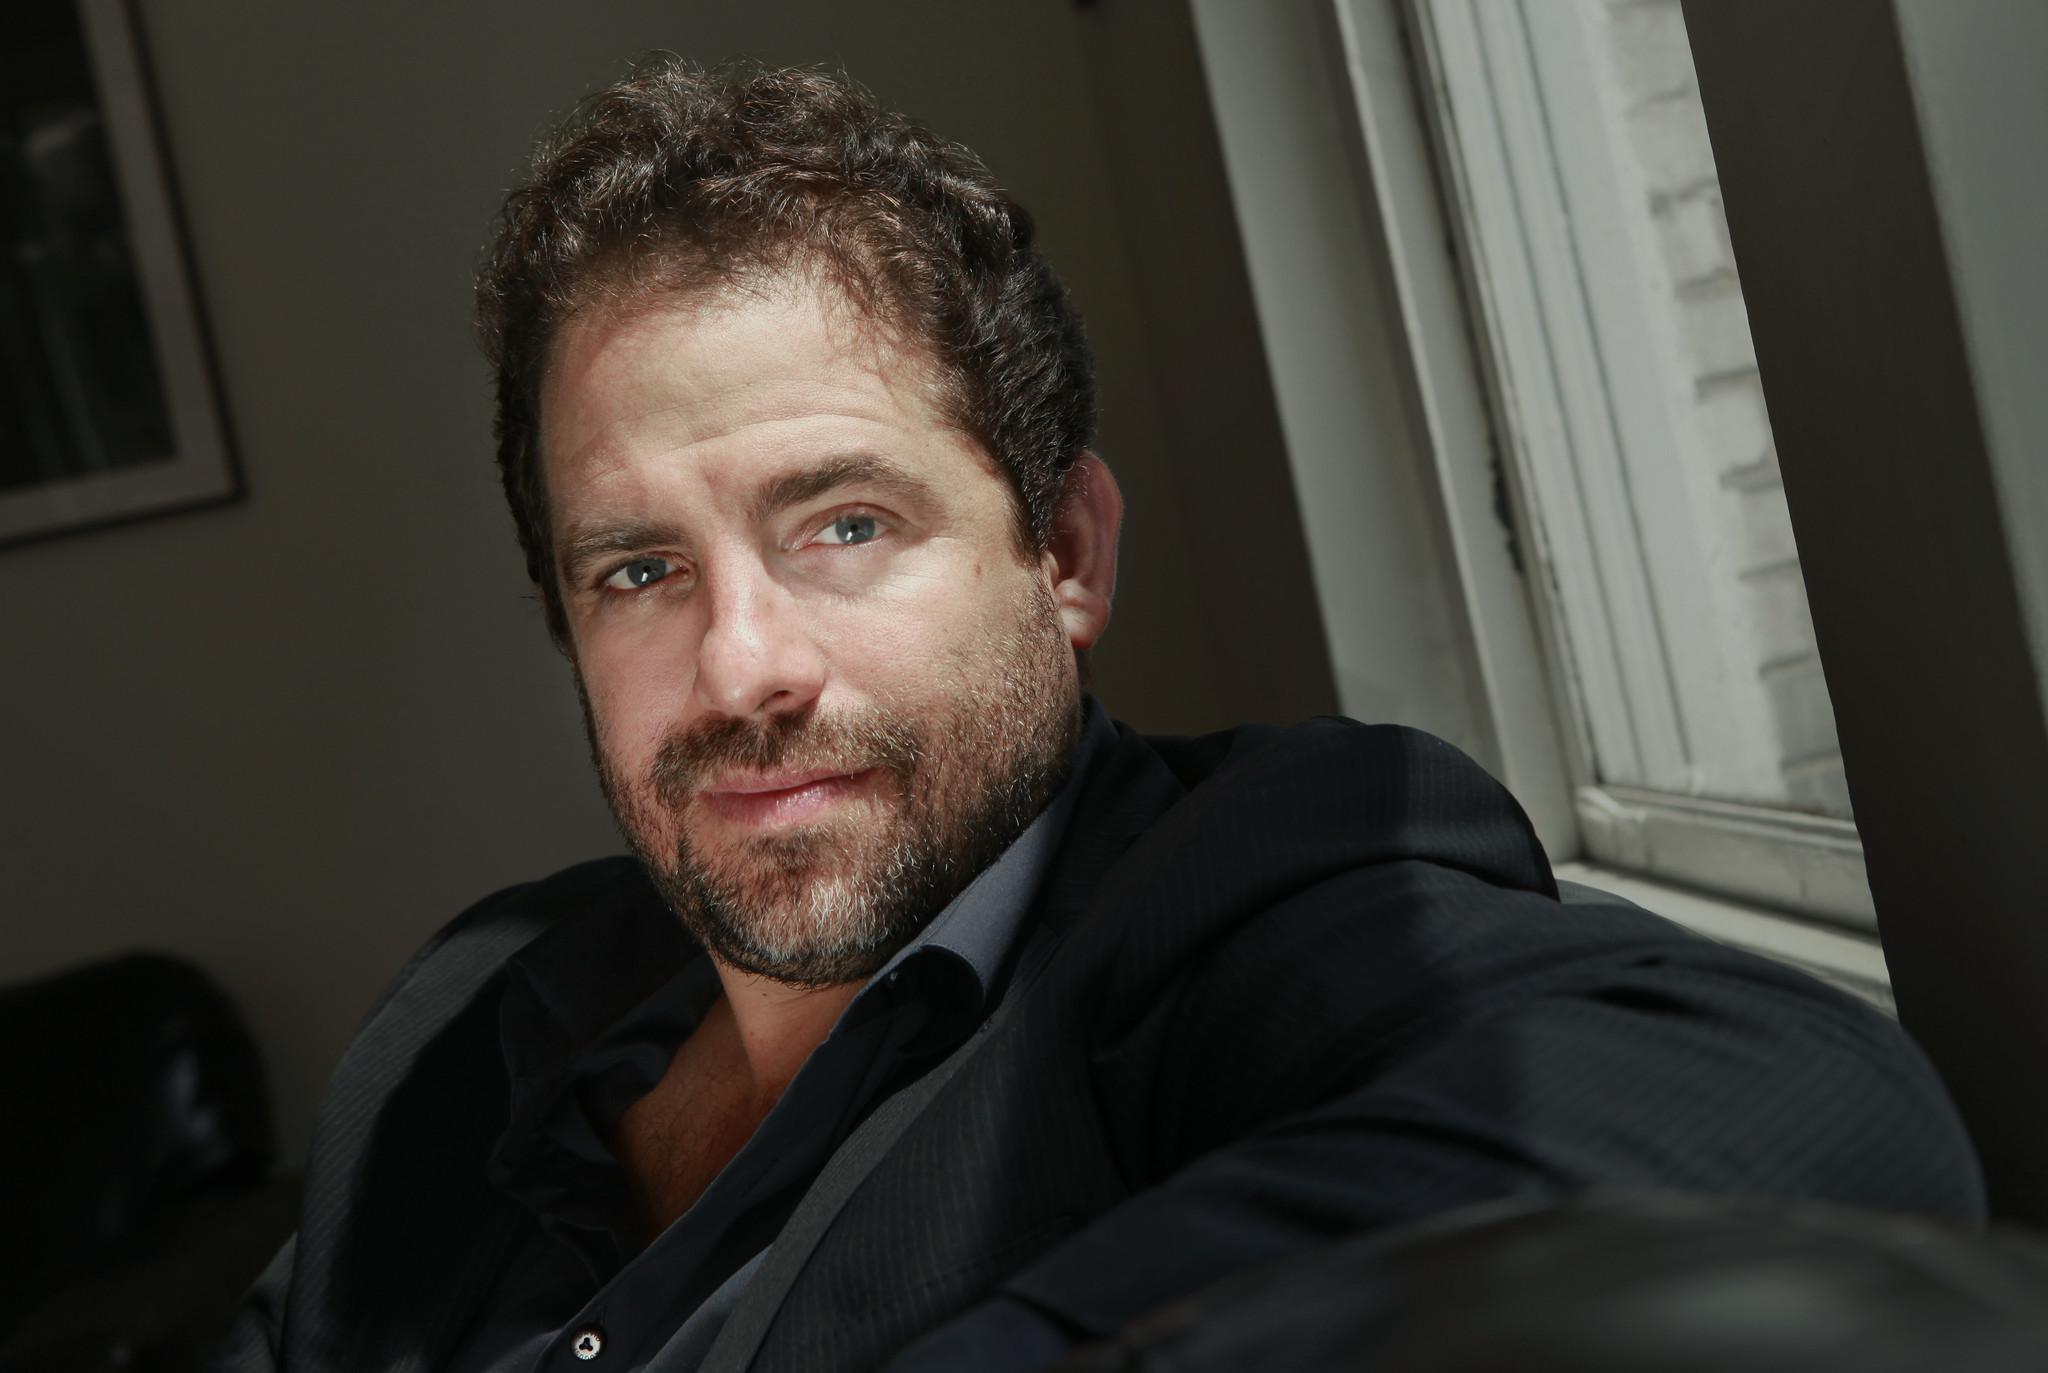 six women accuse filmmaker brett ratner of sexual harassment or